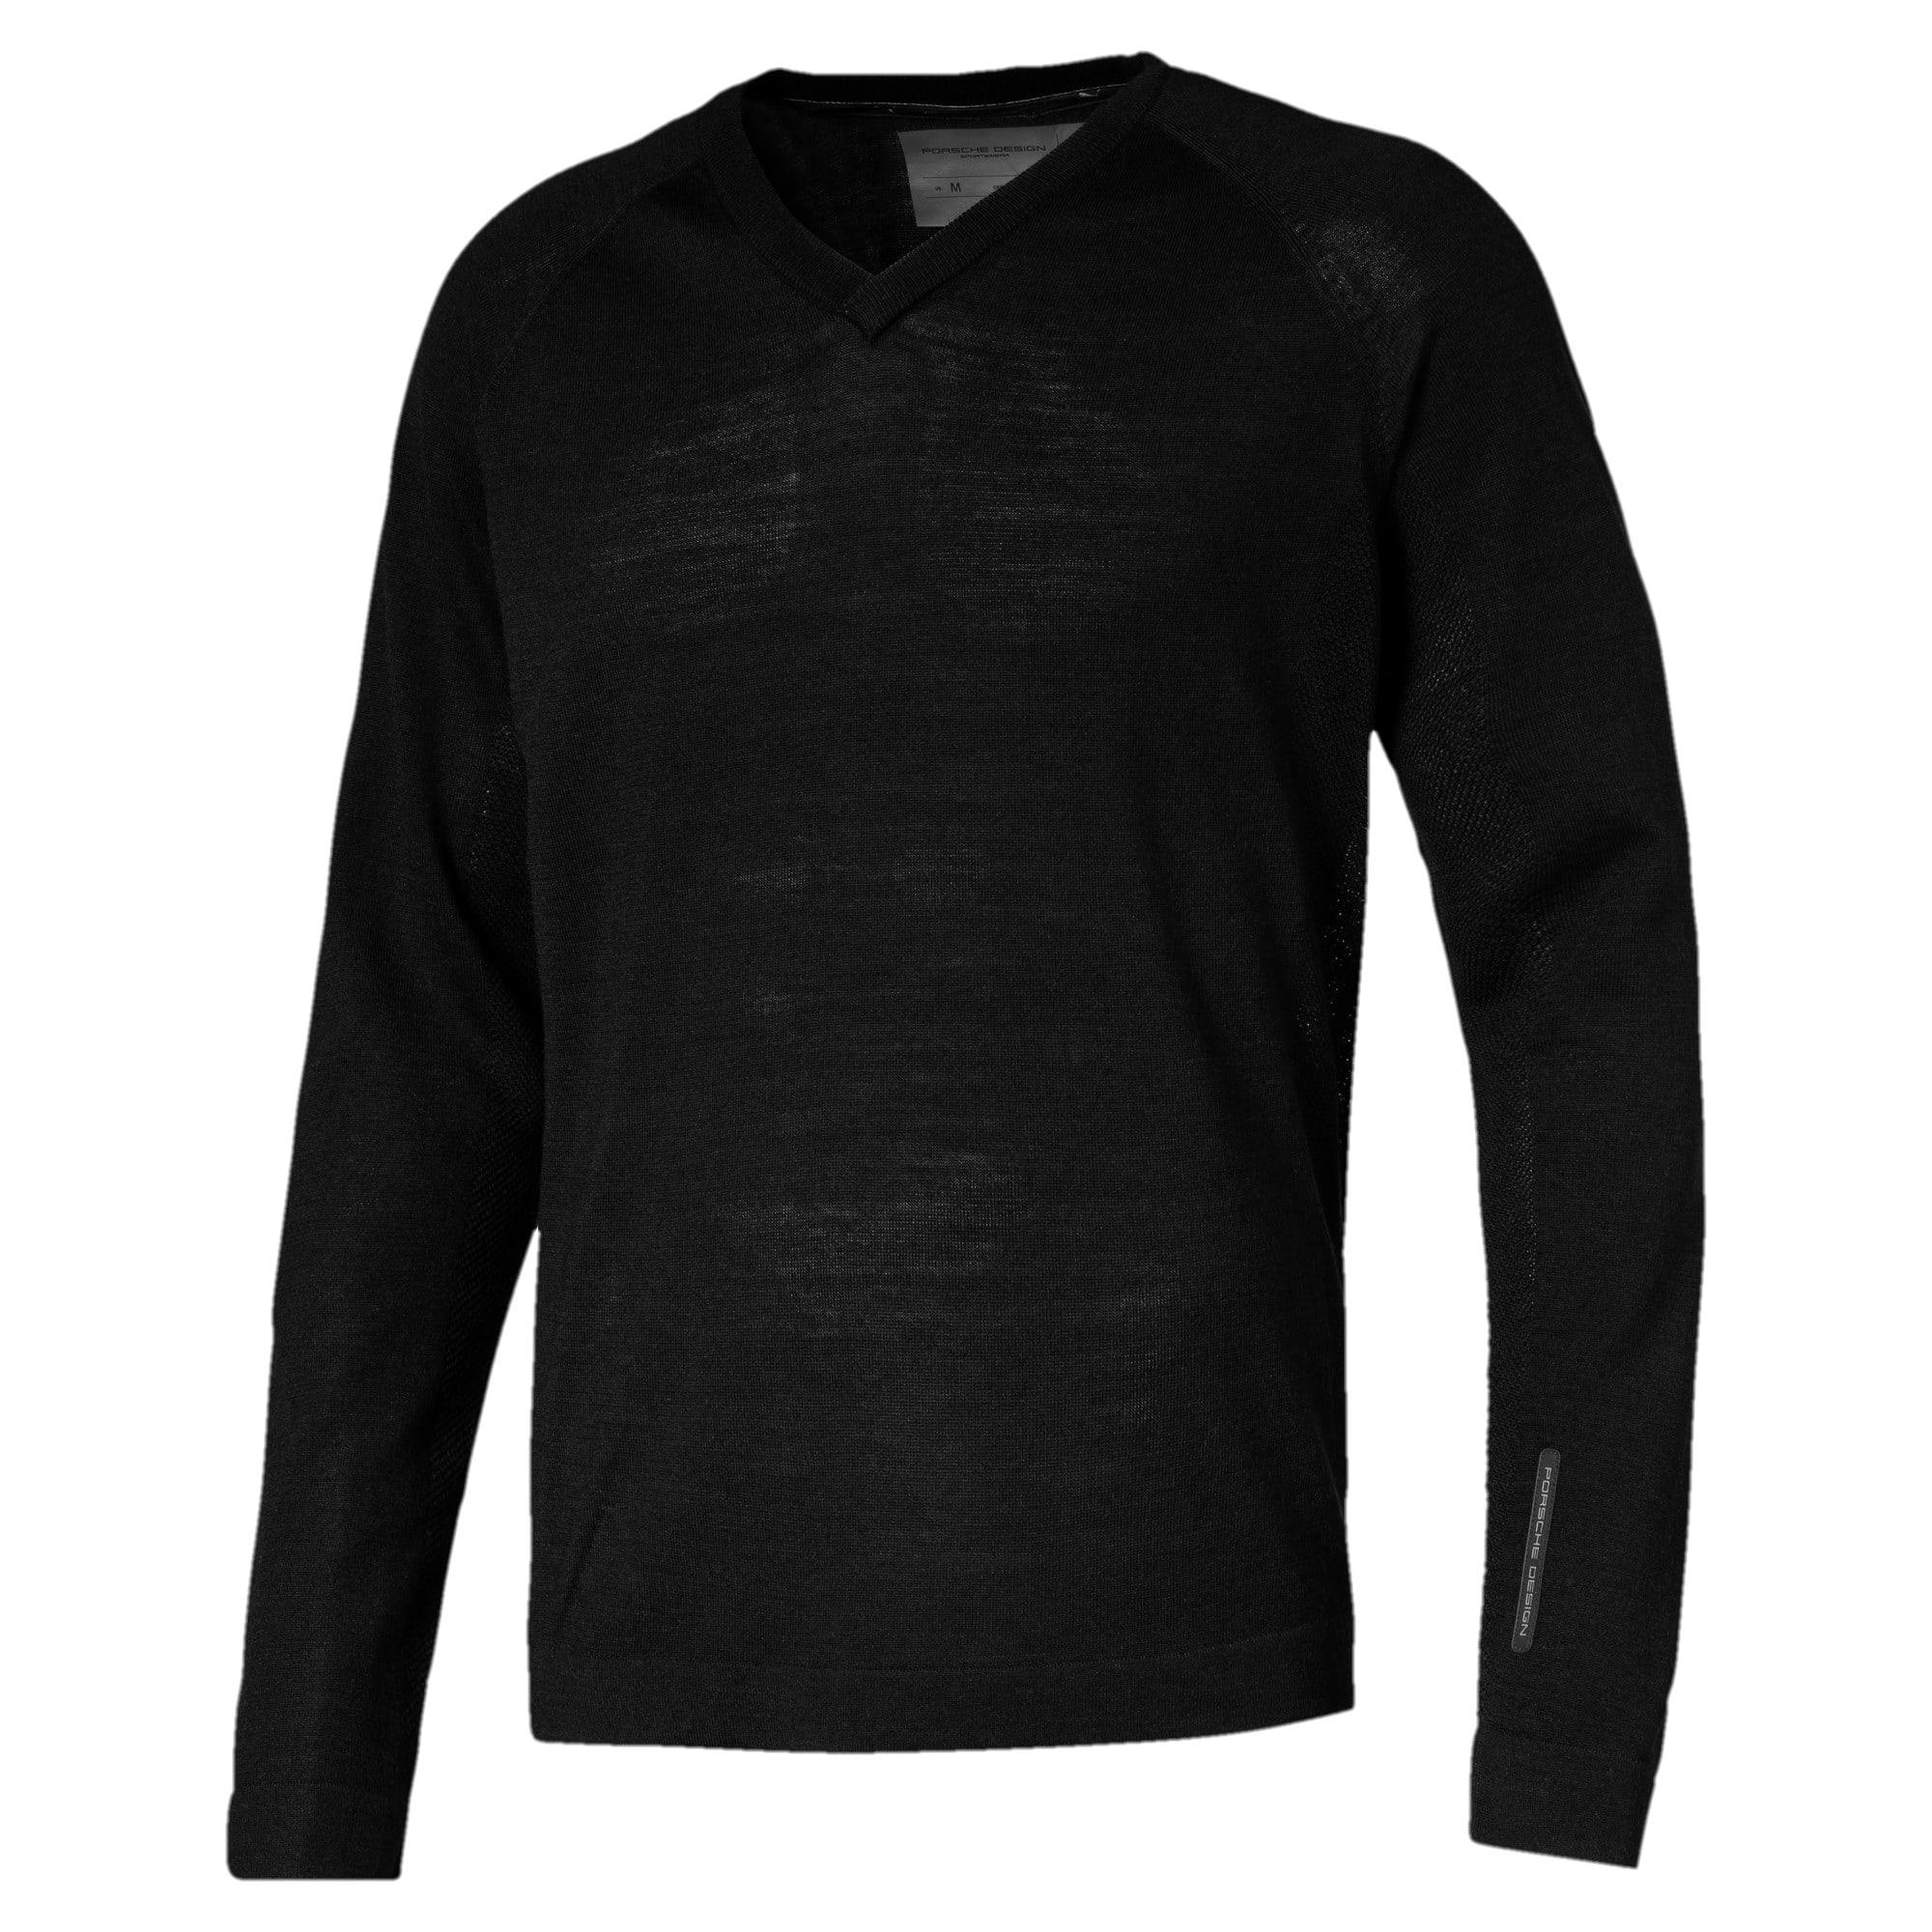 Thumbnail 1 of Porsche Design evoKNIT Herren V-Neck Sweatshirt, Jet Black, medium